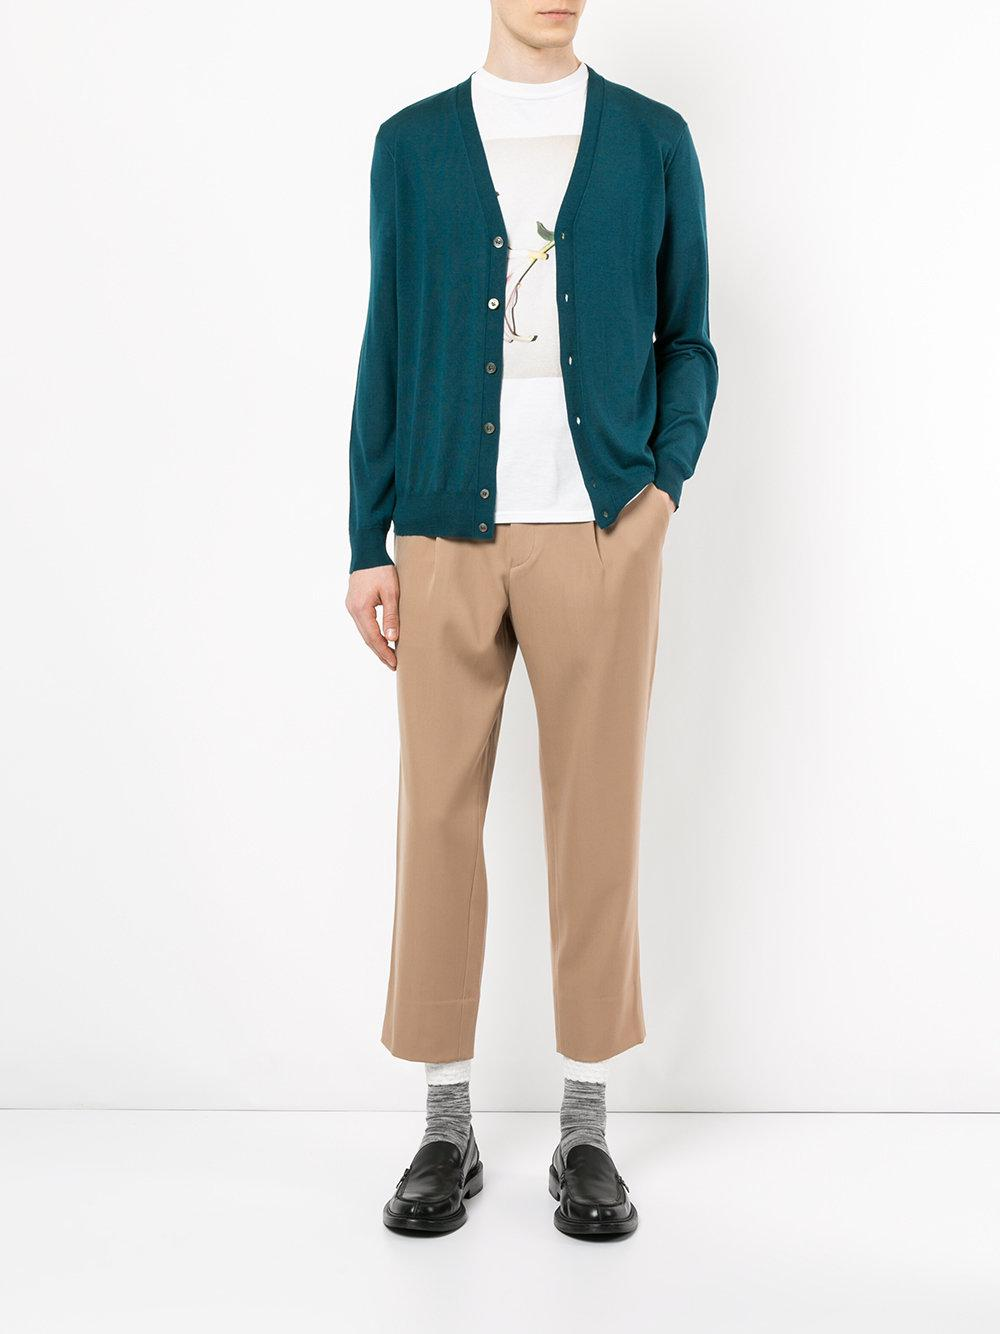 Tomorrowland Wool V-neck Cardigan in Green for Men